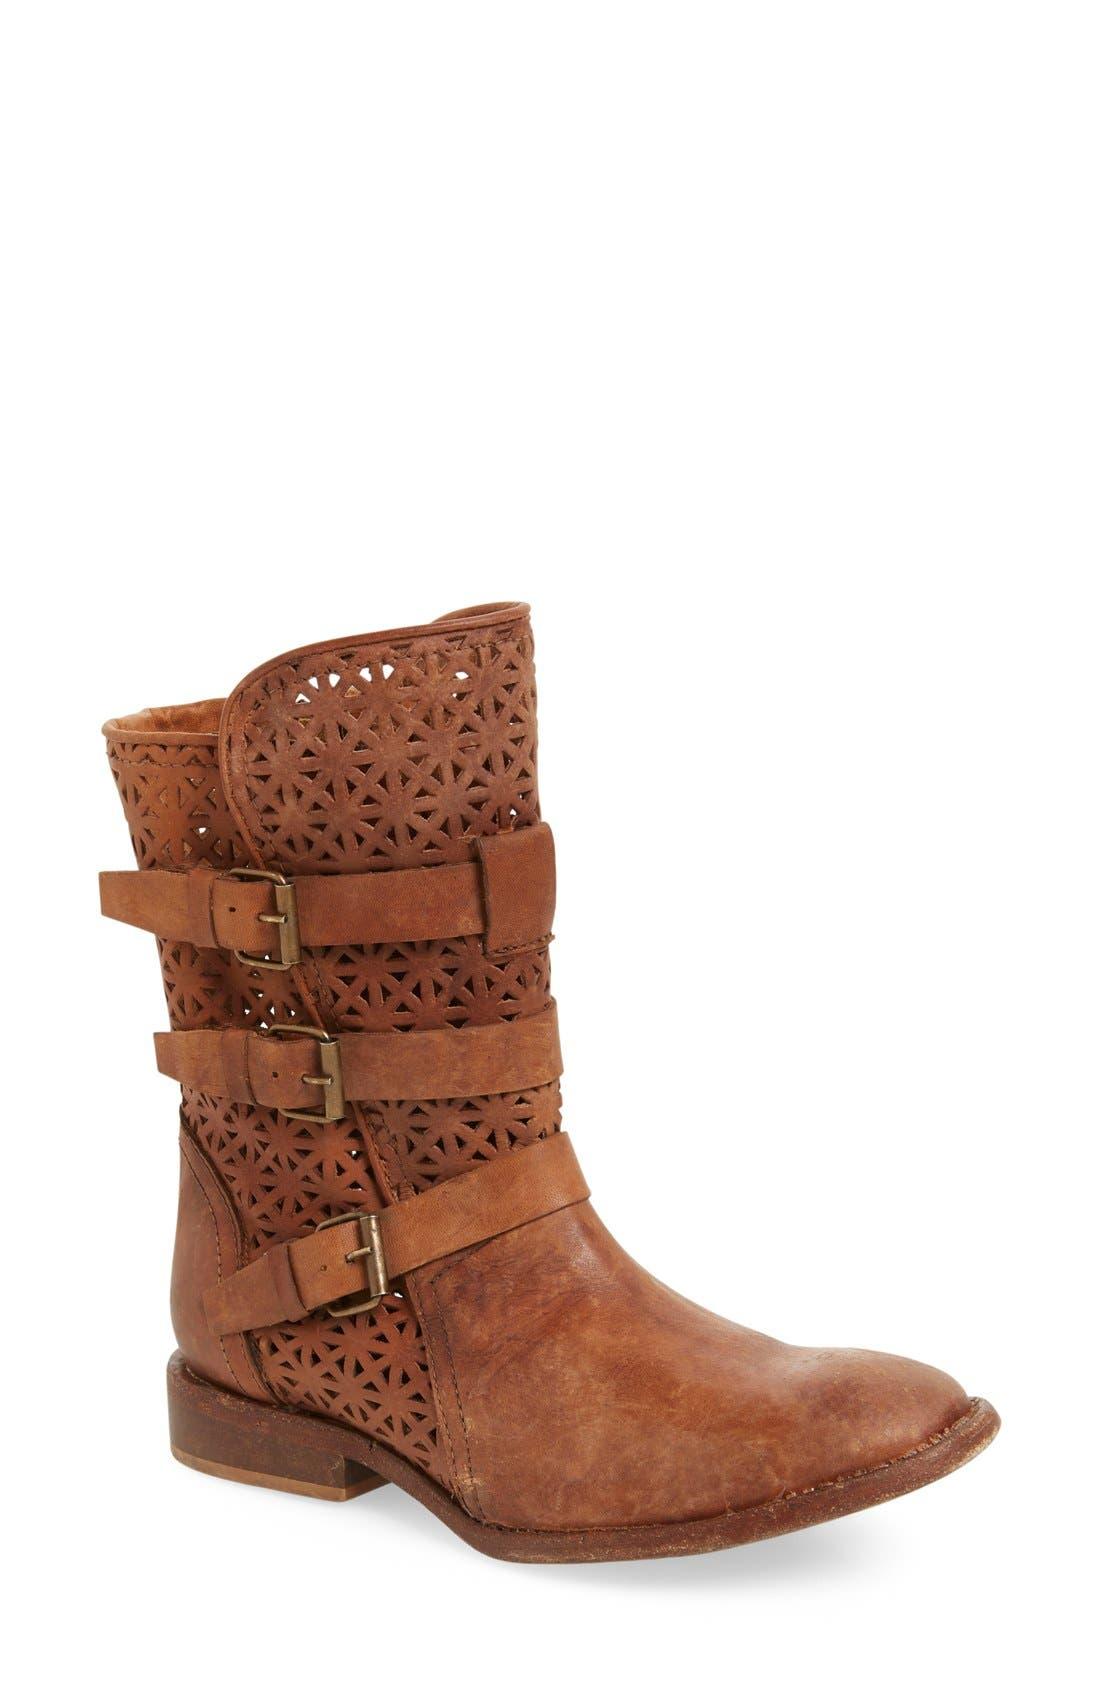 Main Image - Matisse 'National' Perforated Moto Boot (Women)